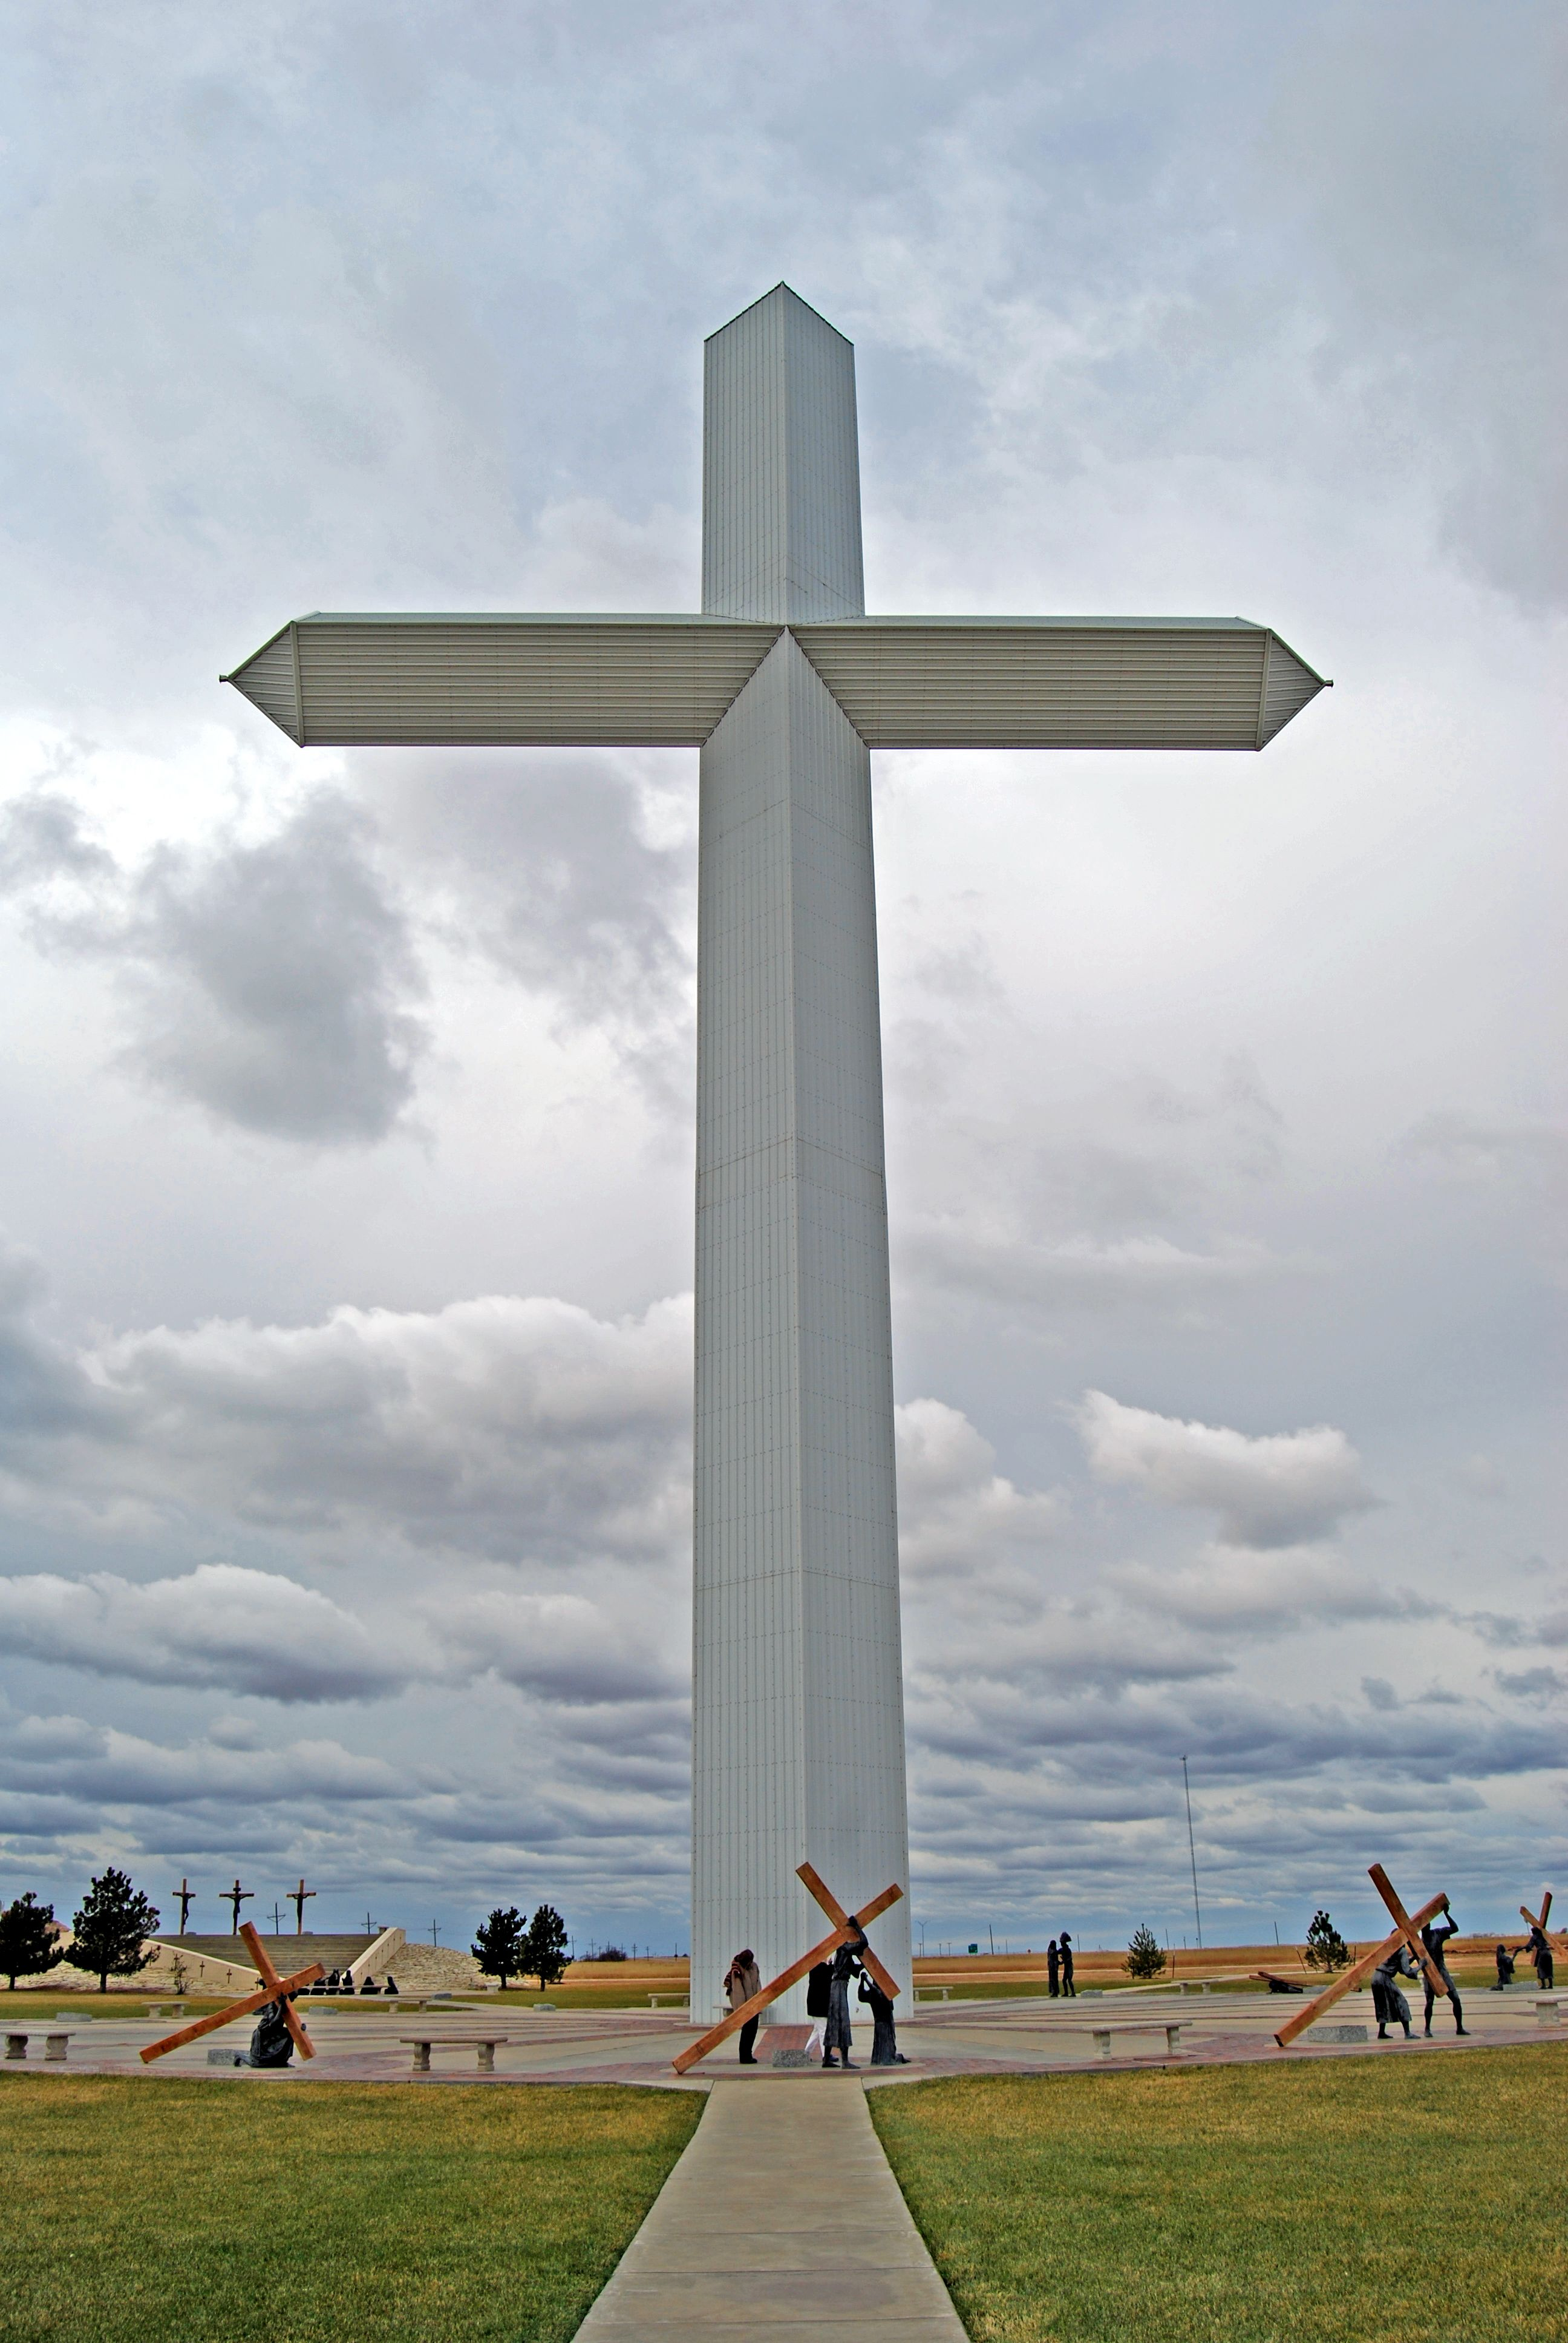 photo tour of the cross of jesus in groom texas have been